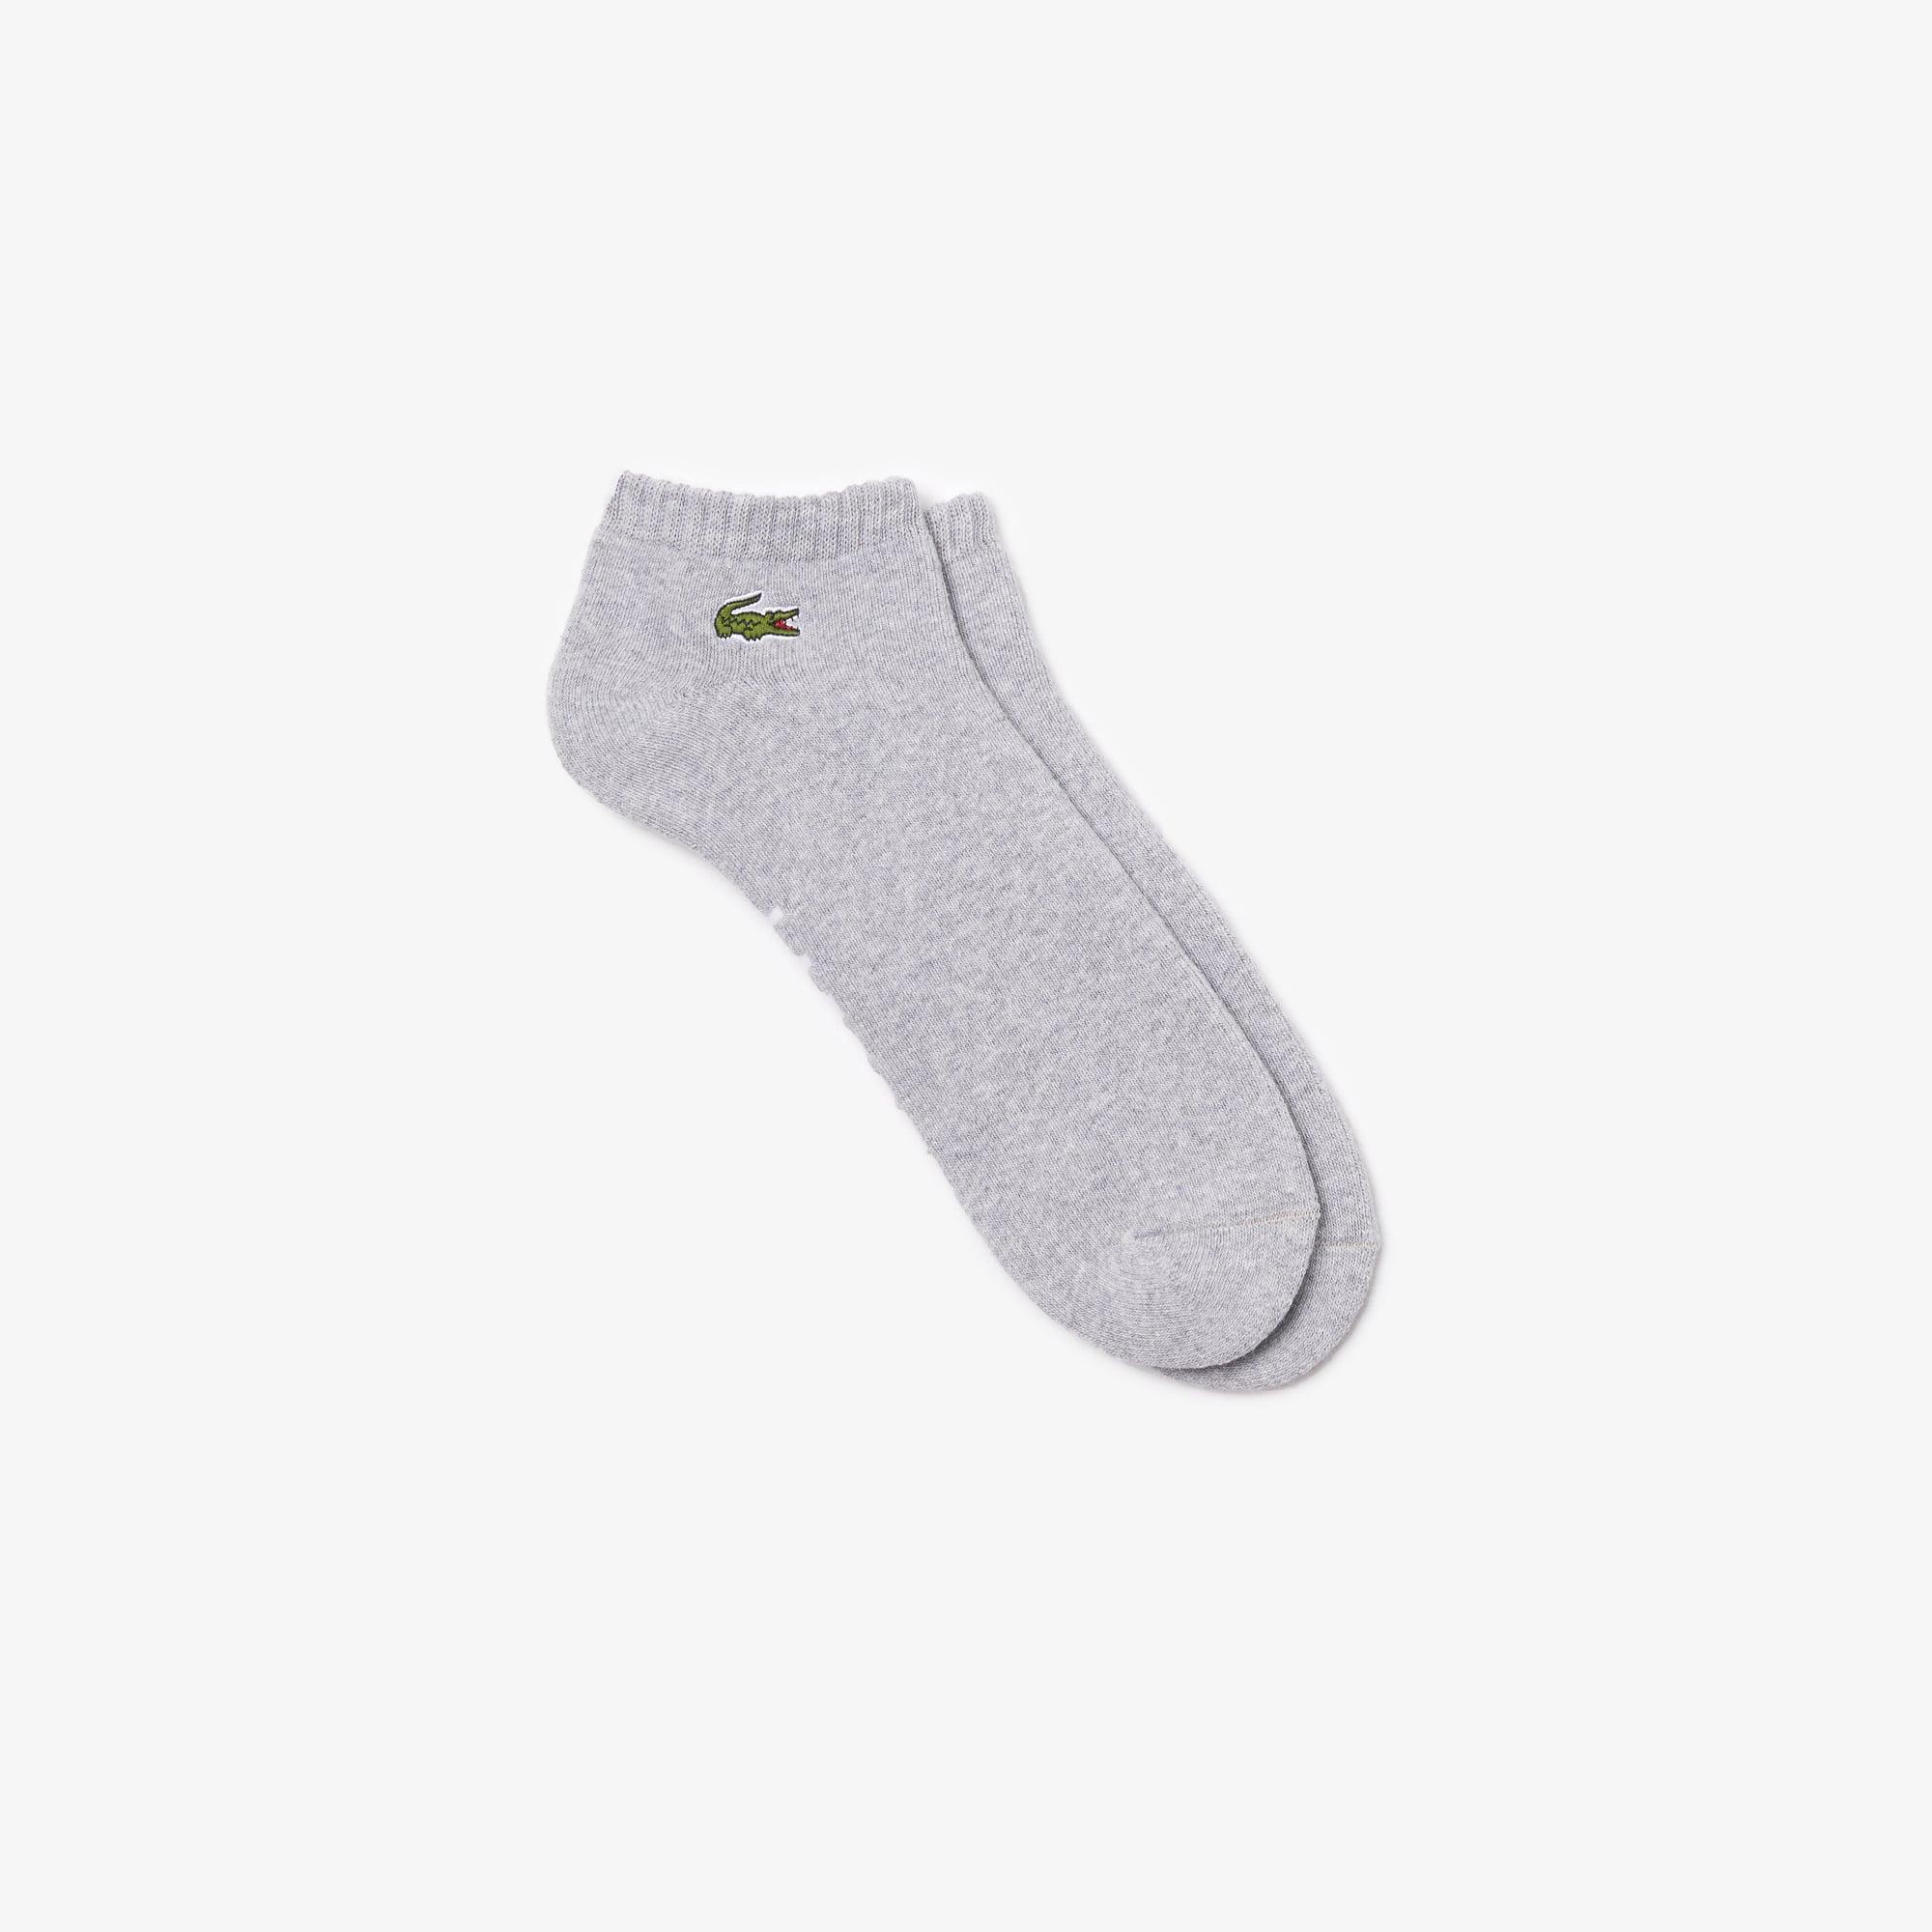 Sneaker-Socken aus einfarbigem Baumwollfrottee LACOSTE SPORT Tennis